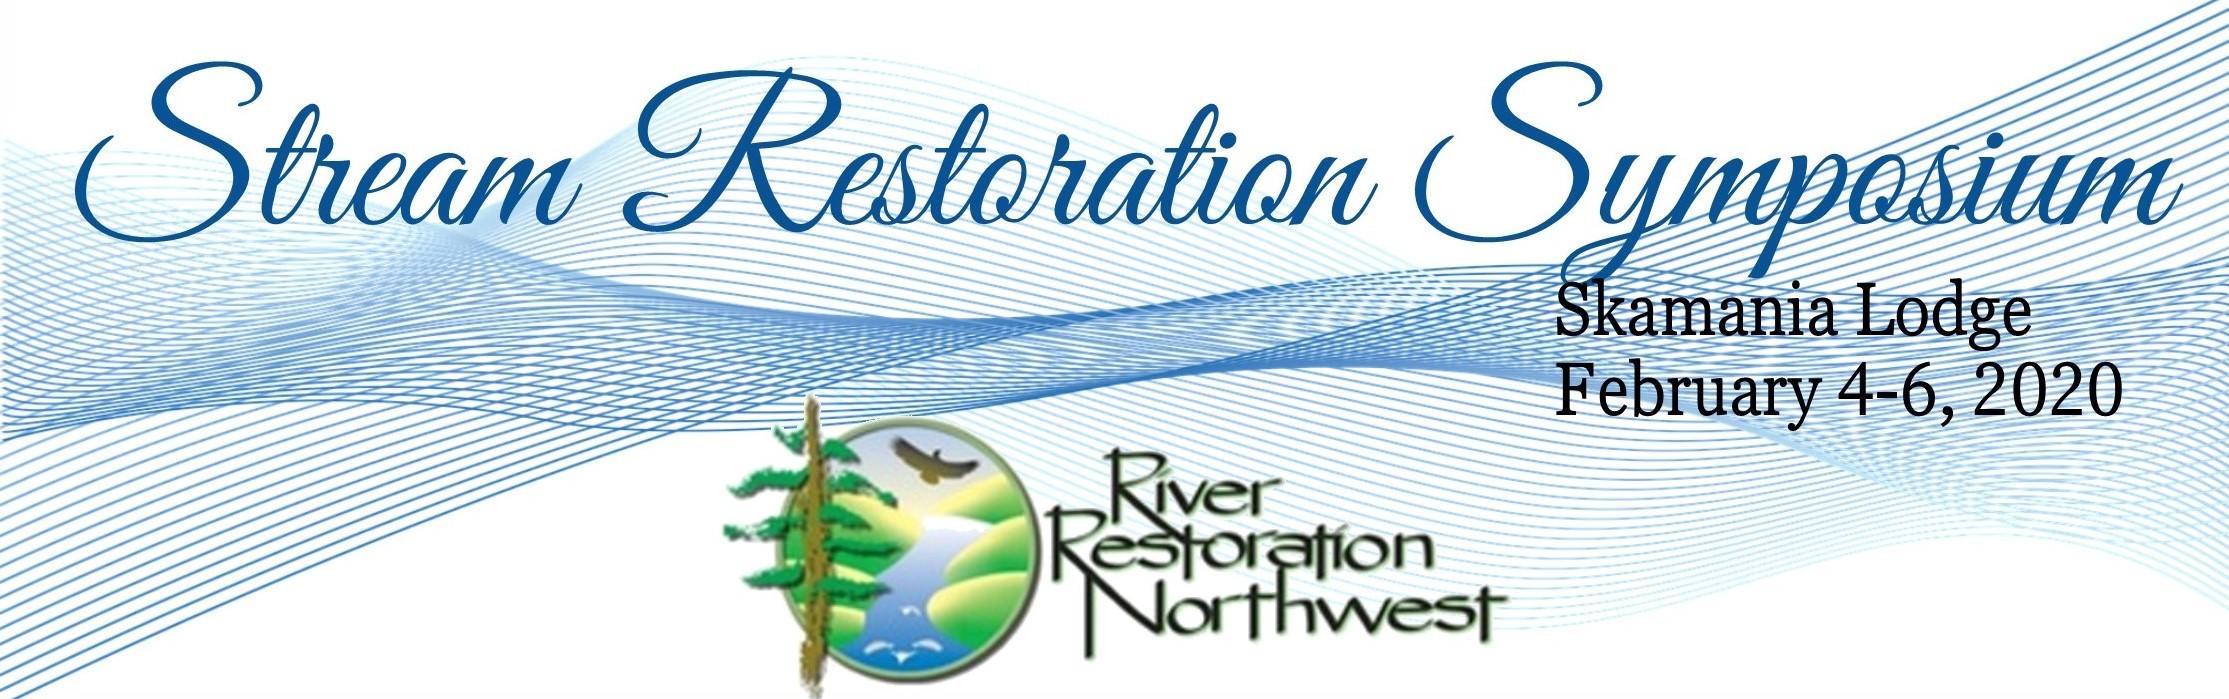 Sponsorship: RRNW Symposium 2020